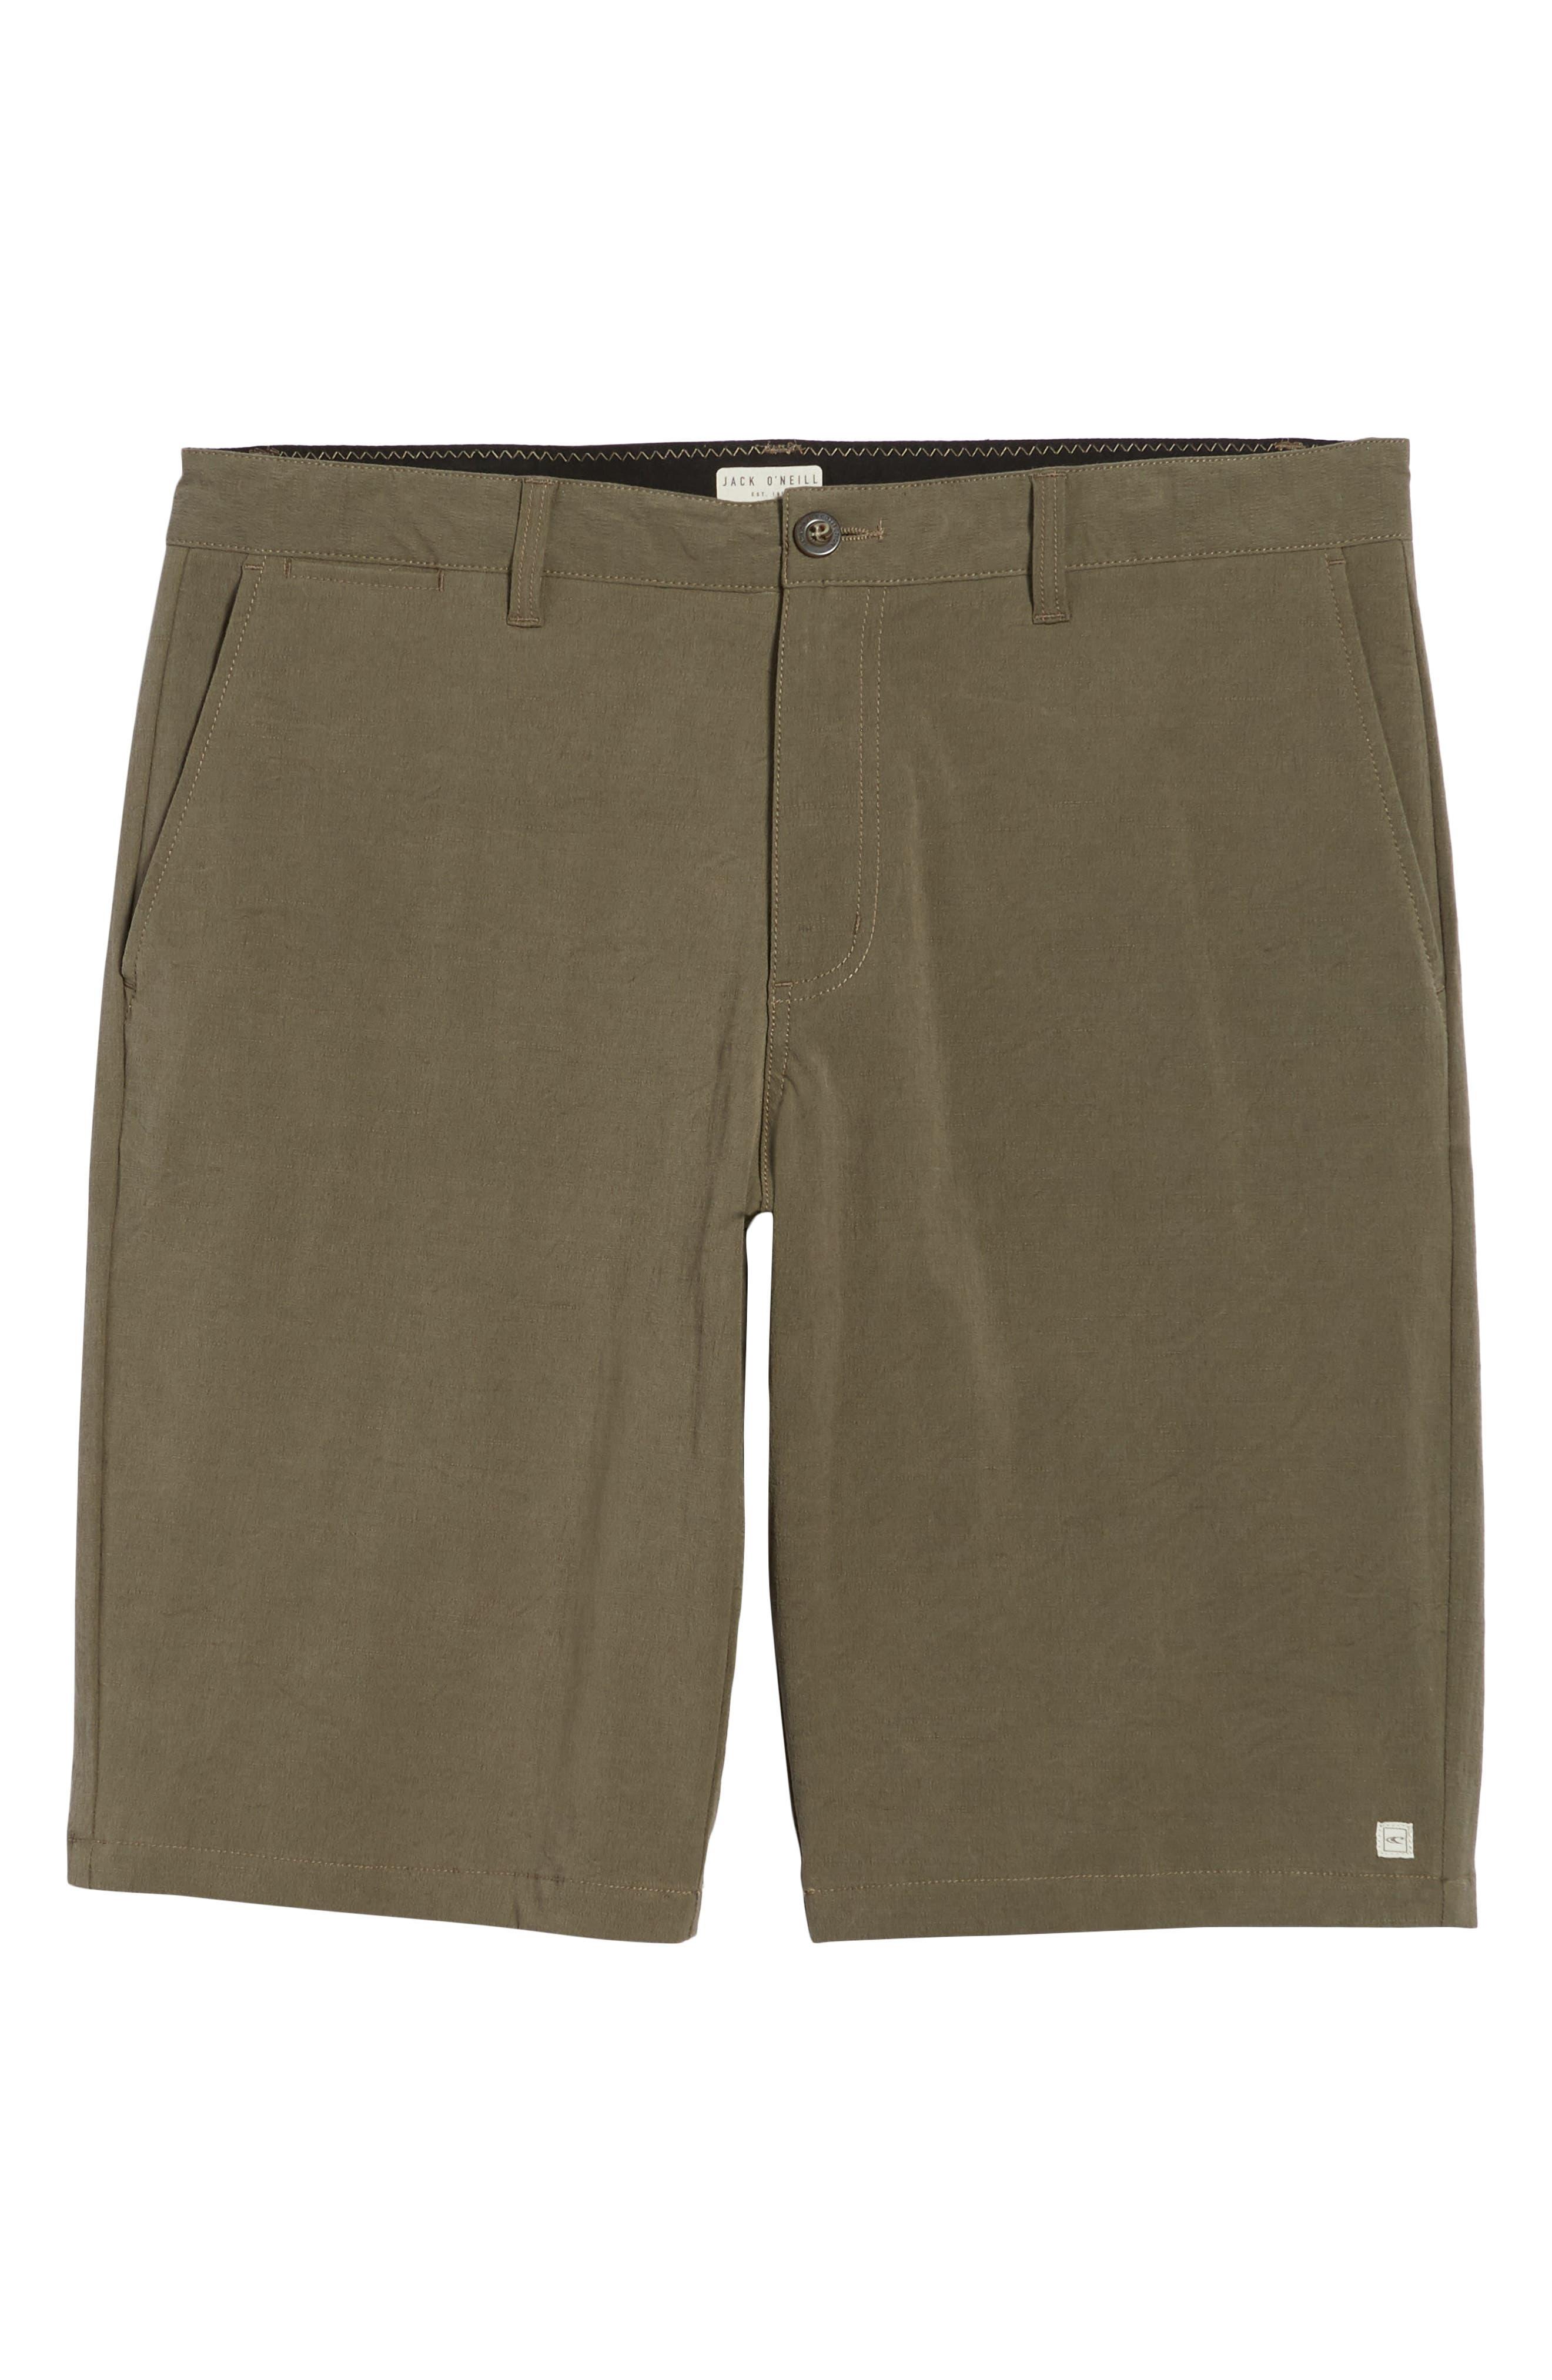 Coast Stretch Board Shorts,                             Alternate thumbnail 17, color,